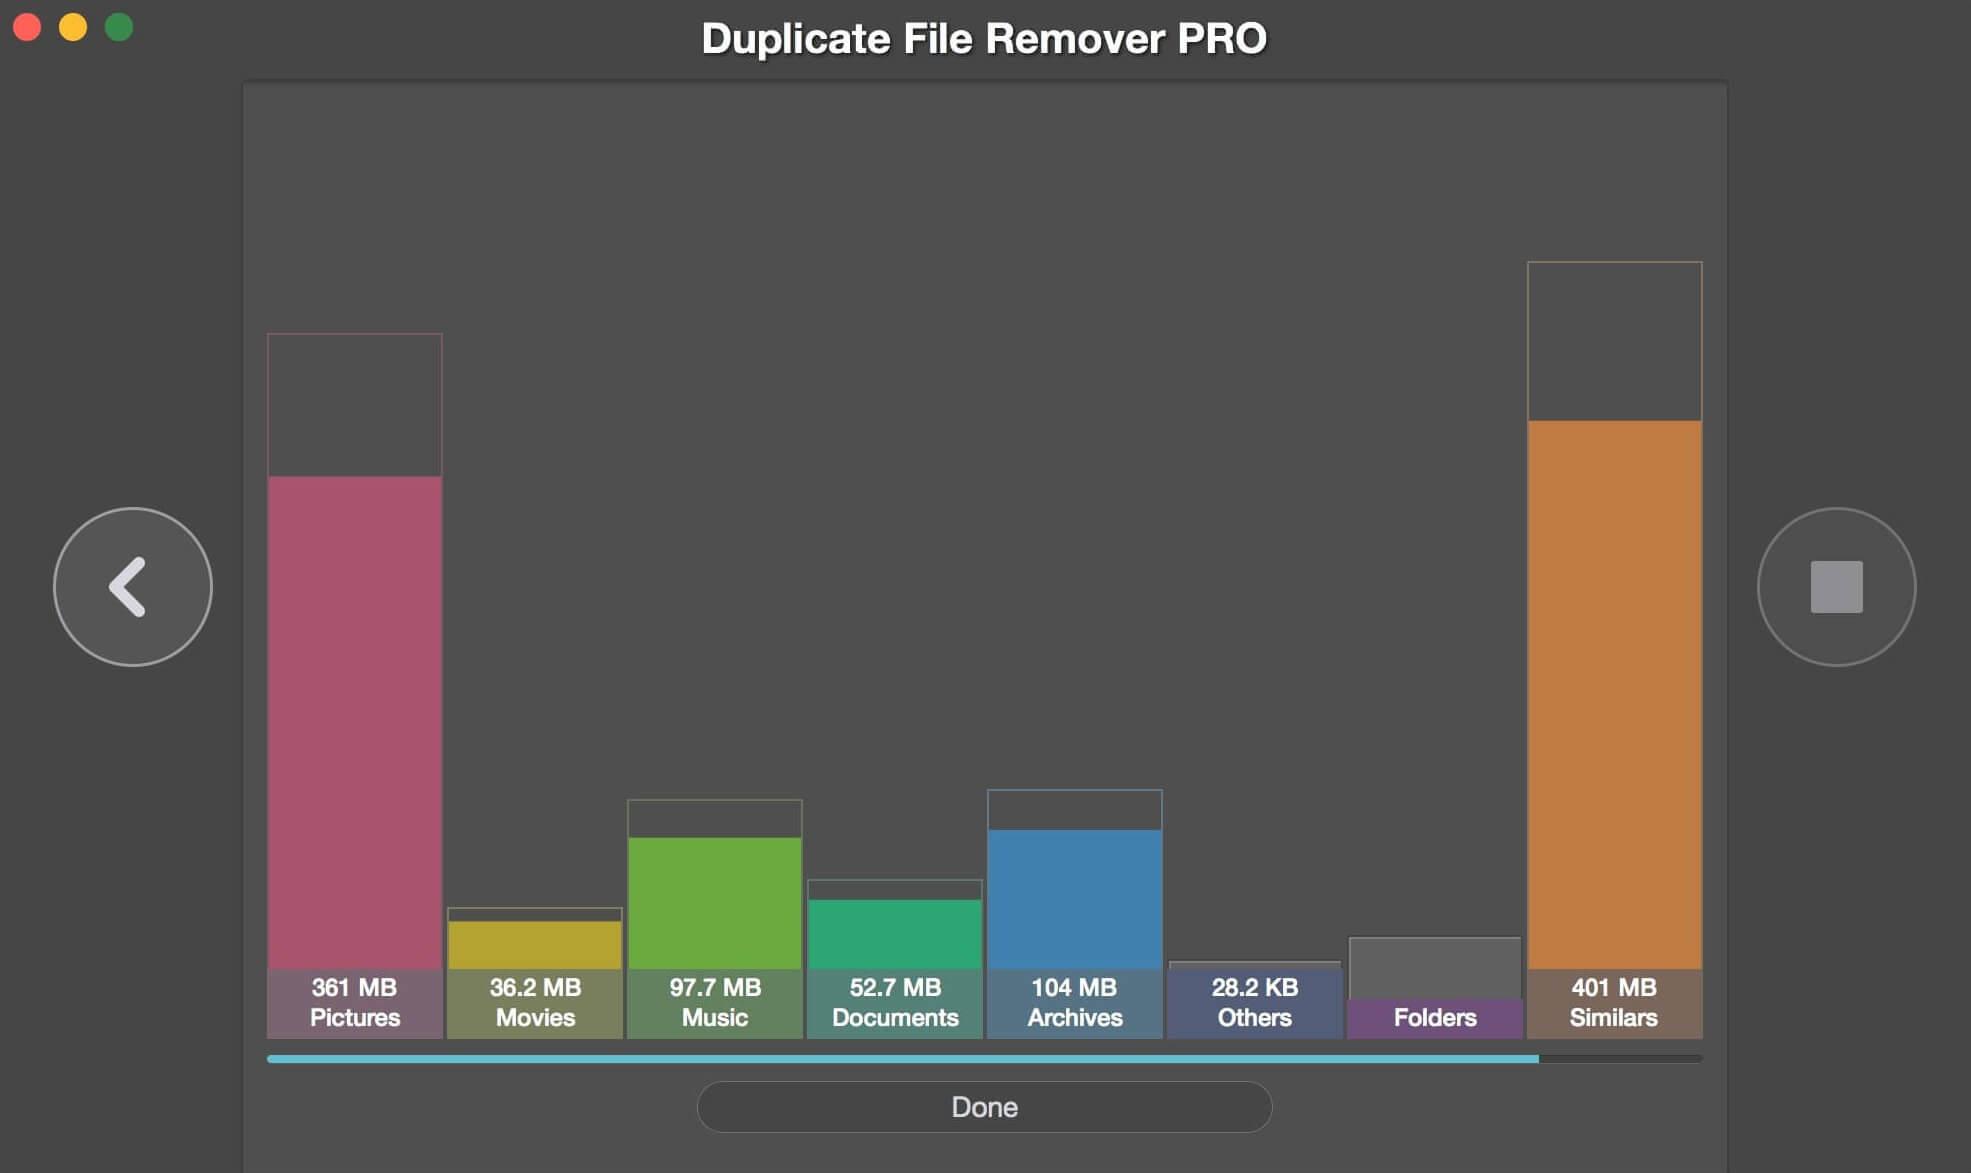 Duplicate File Remover Pro chart